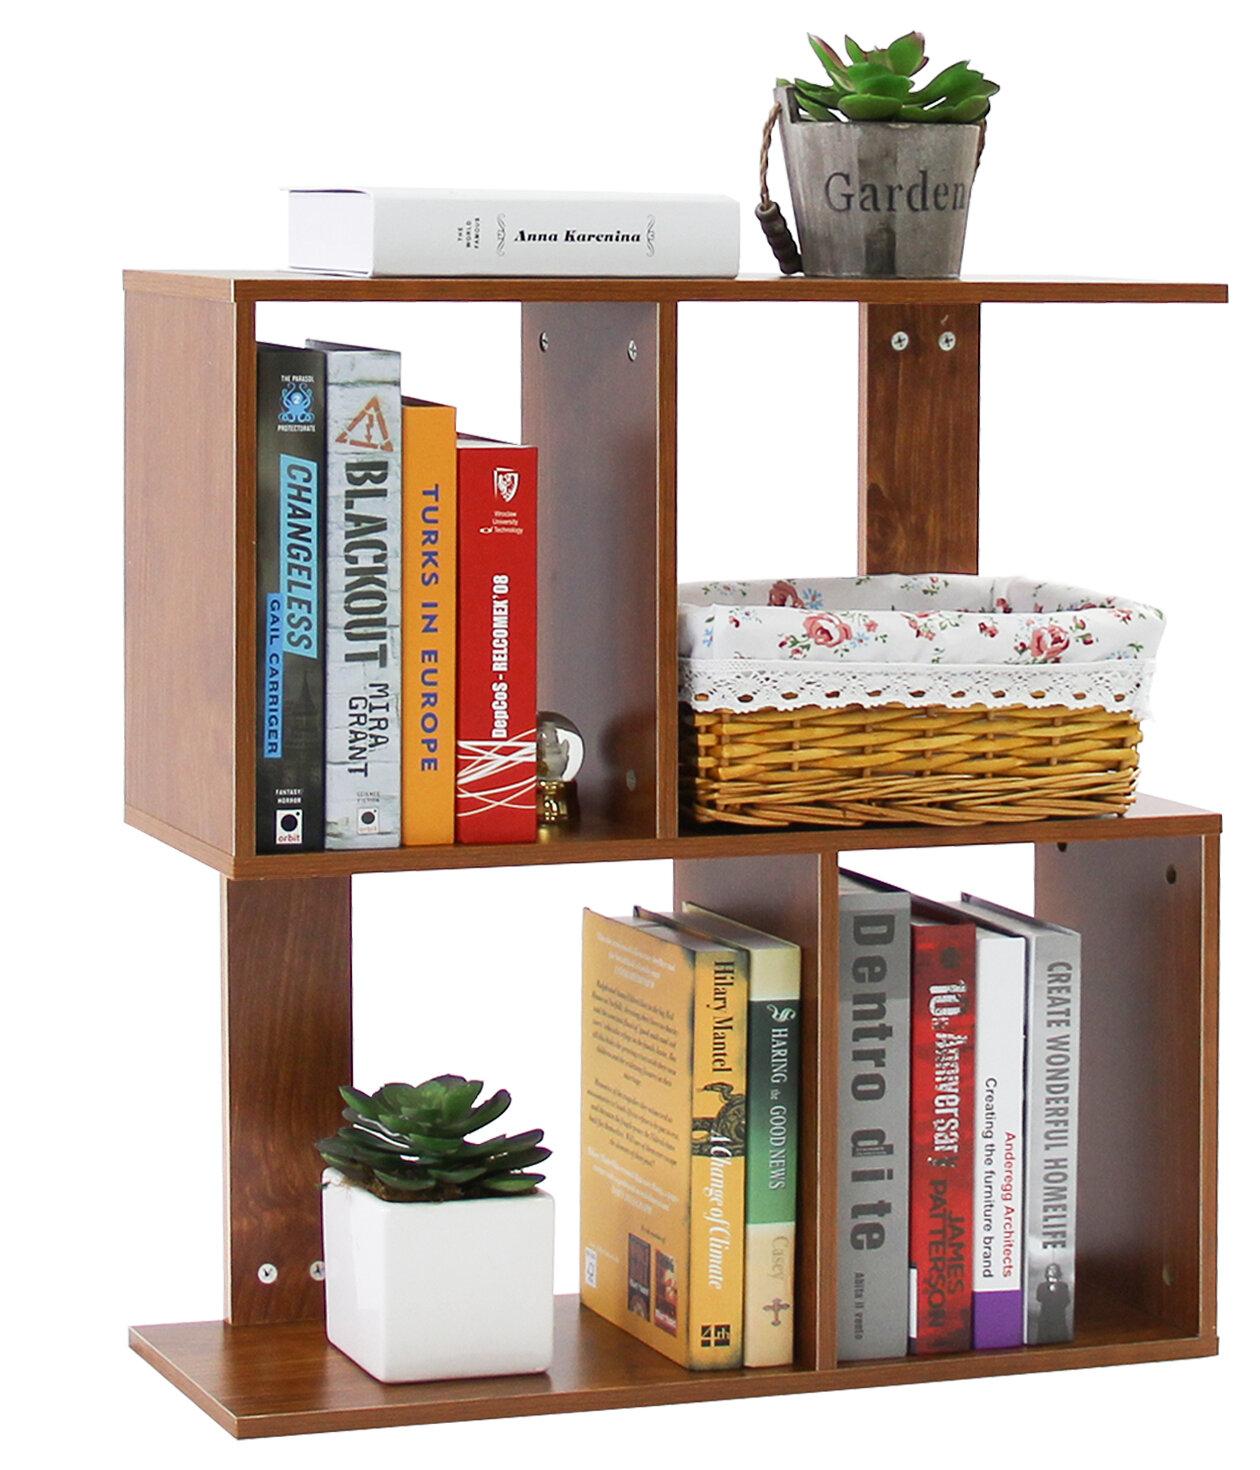 NEW Small 2 Shelf Bookcase Wood Bookshelf Storage Adjustable Shelving Organizer